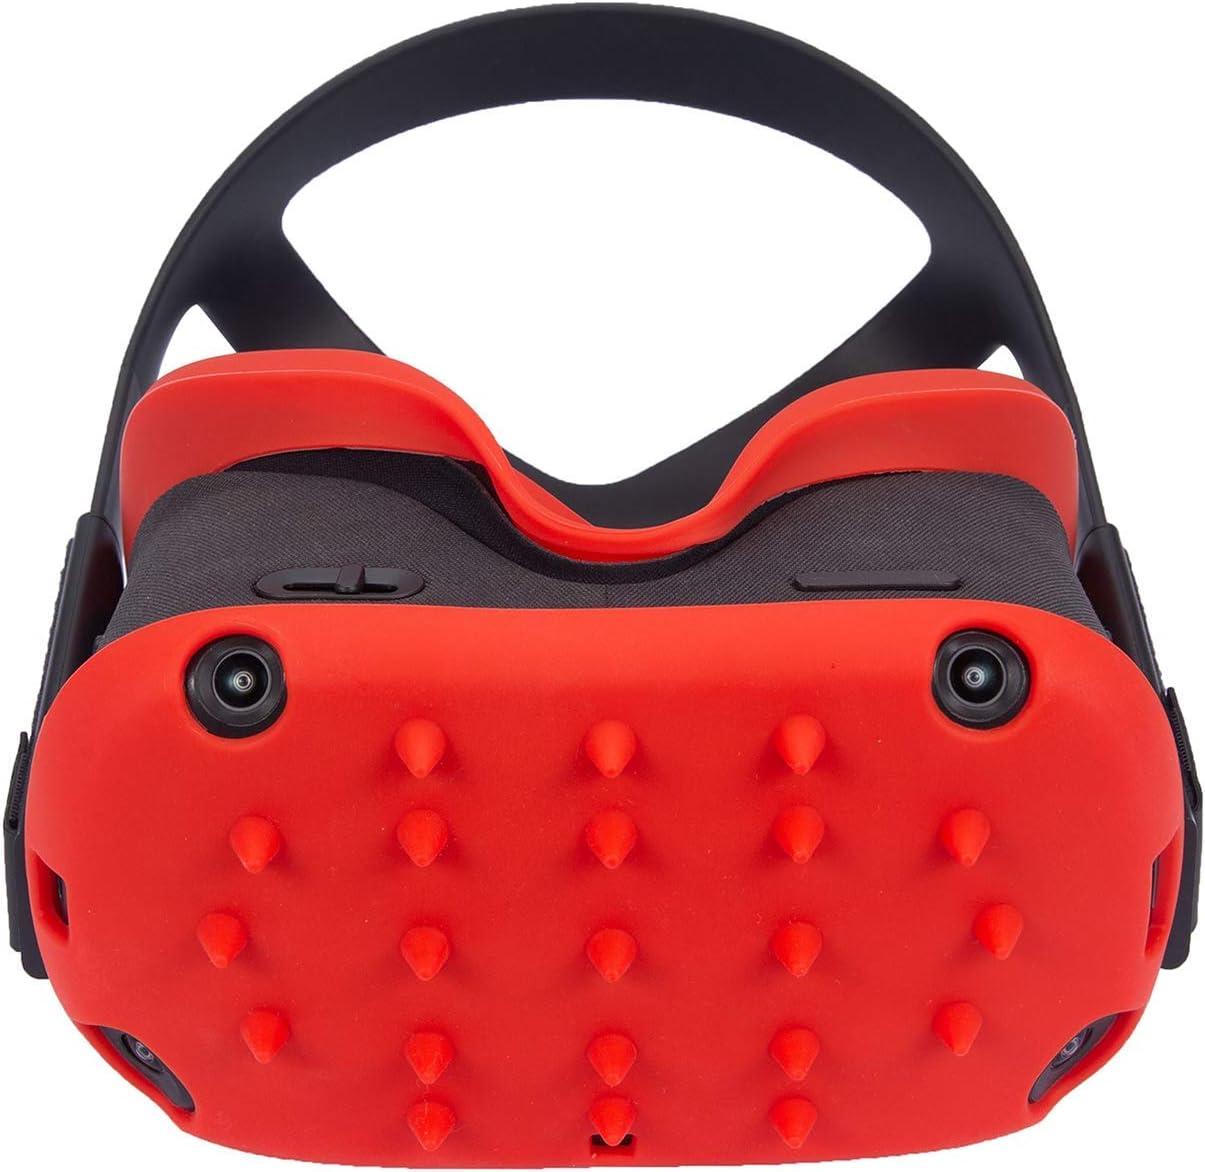 VR Face Avant Portective Cover /& Interface Face Pad Cover Silicone pour Oculus Quest Skin /& Cover Noir